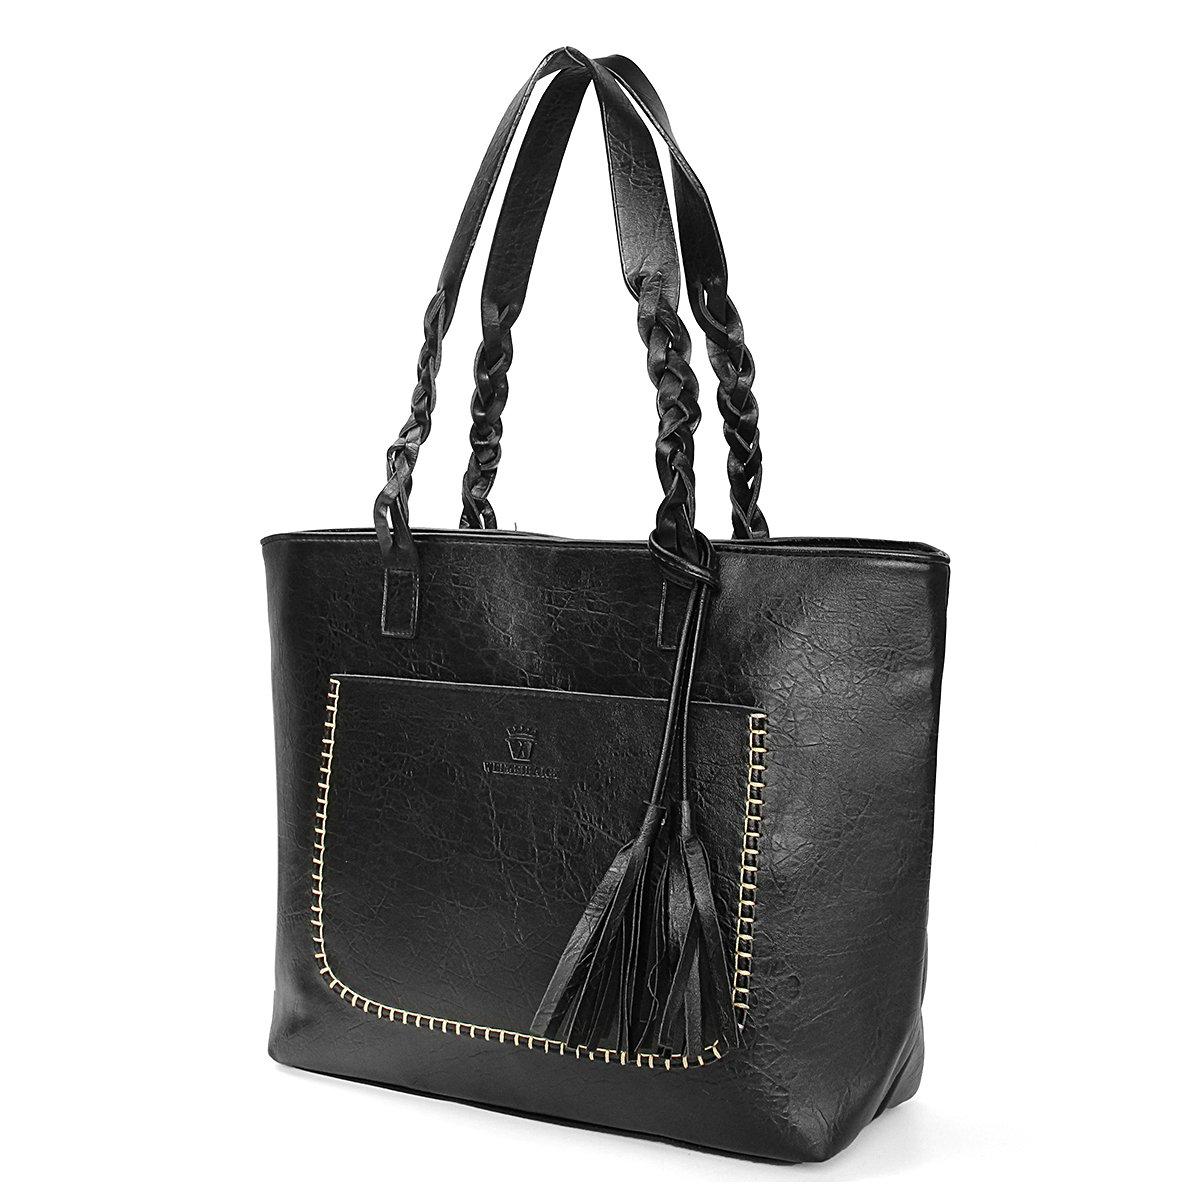 64bc009a6b7 Amazon.com  Women Vintage Tote Bag, OURBAG Ladies PU Leather Tote Shoulder  Bag Handbag Purse Big Large Black  Clothing